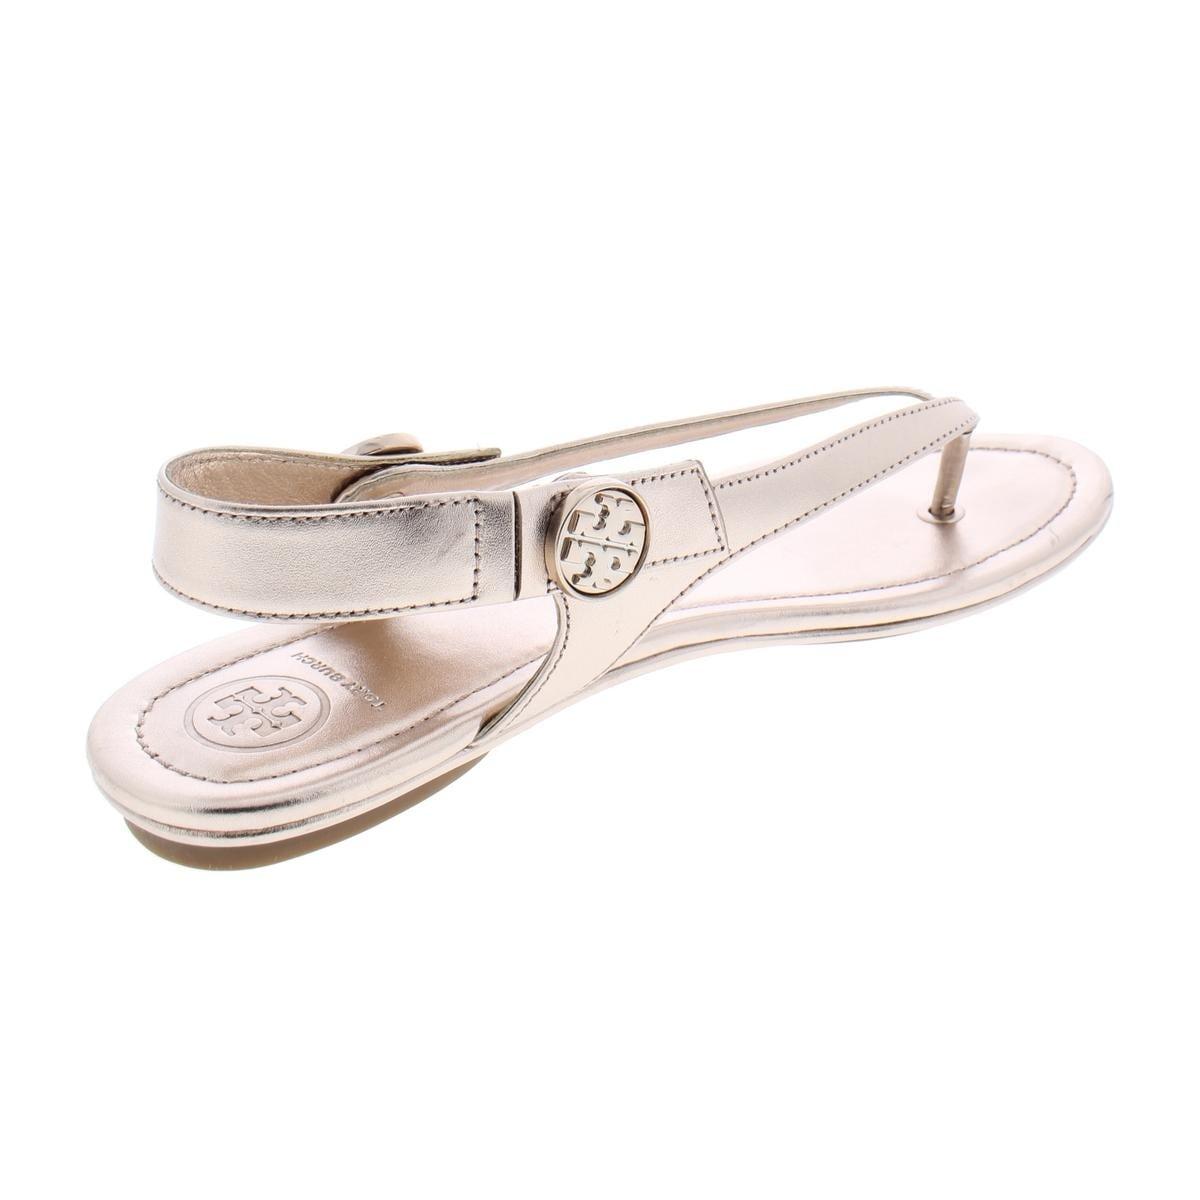 09aae20f1 Shop Tory Burch Womens Minnie Travel Sandal Flat Sandals Flats Thongs - 8.5  Medium (B